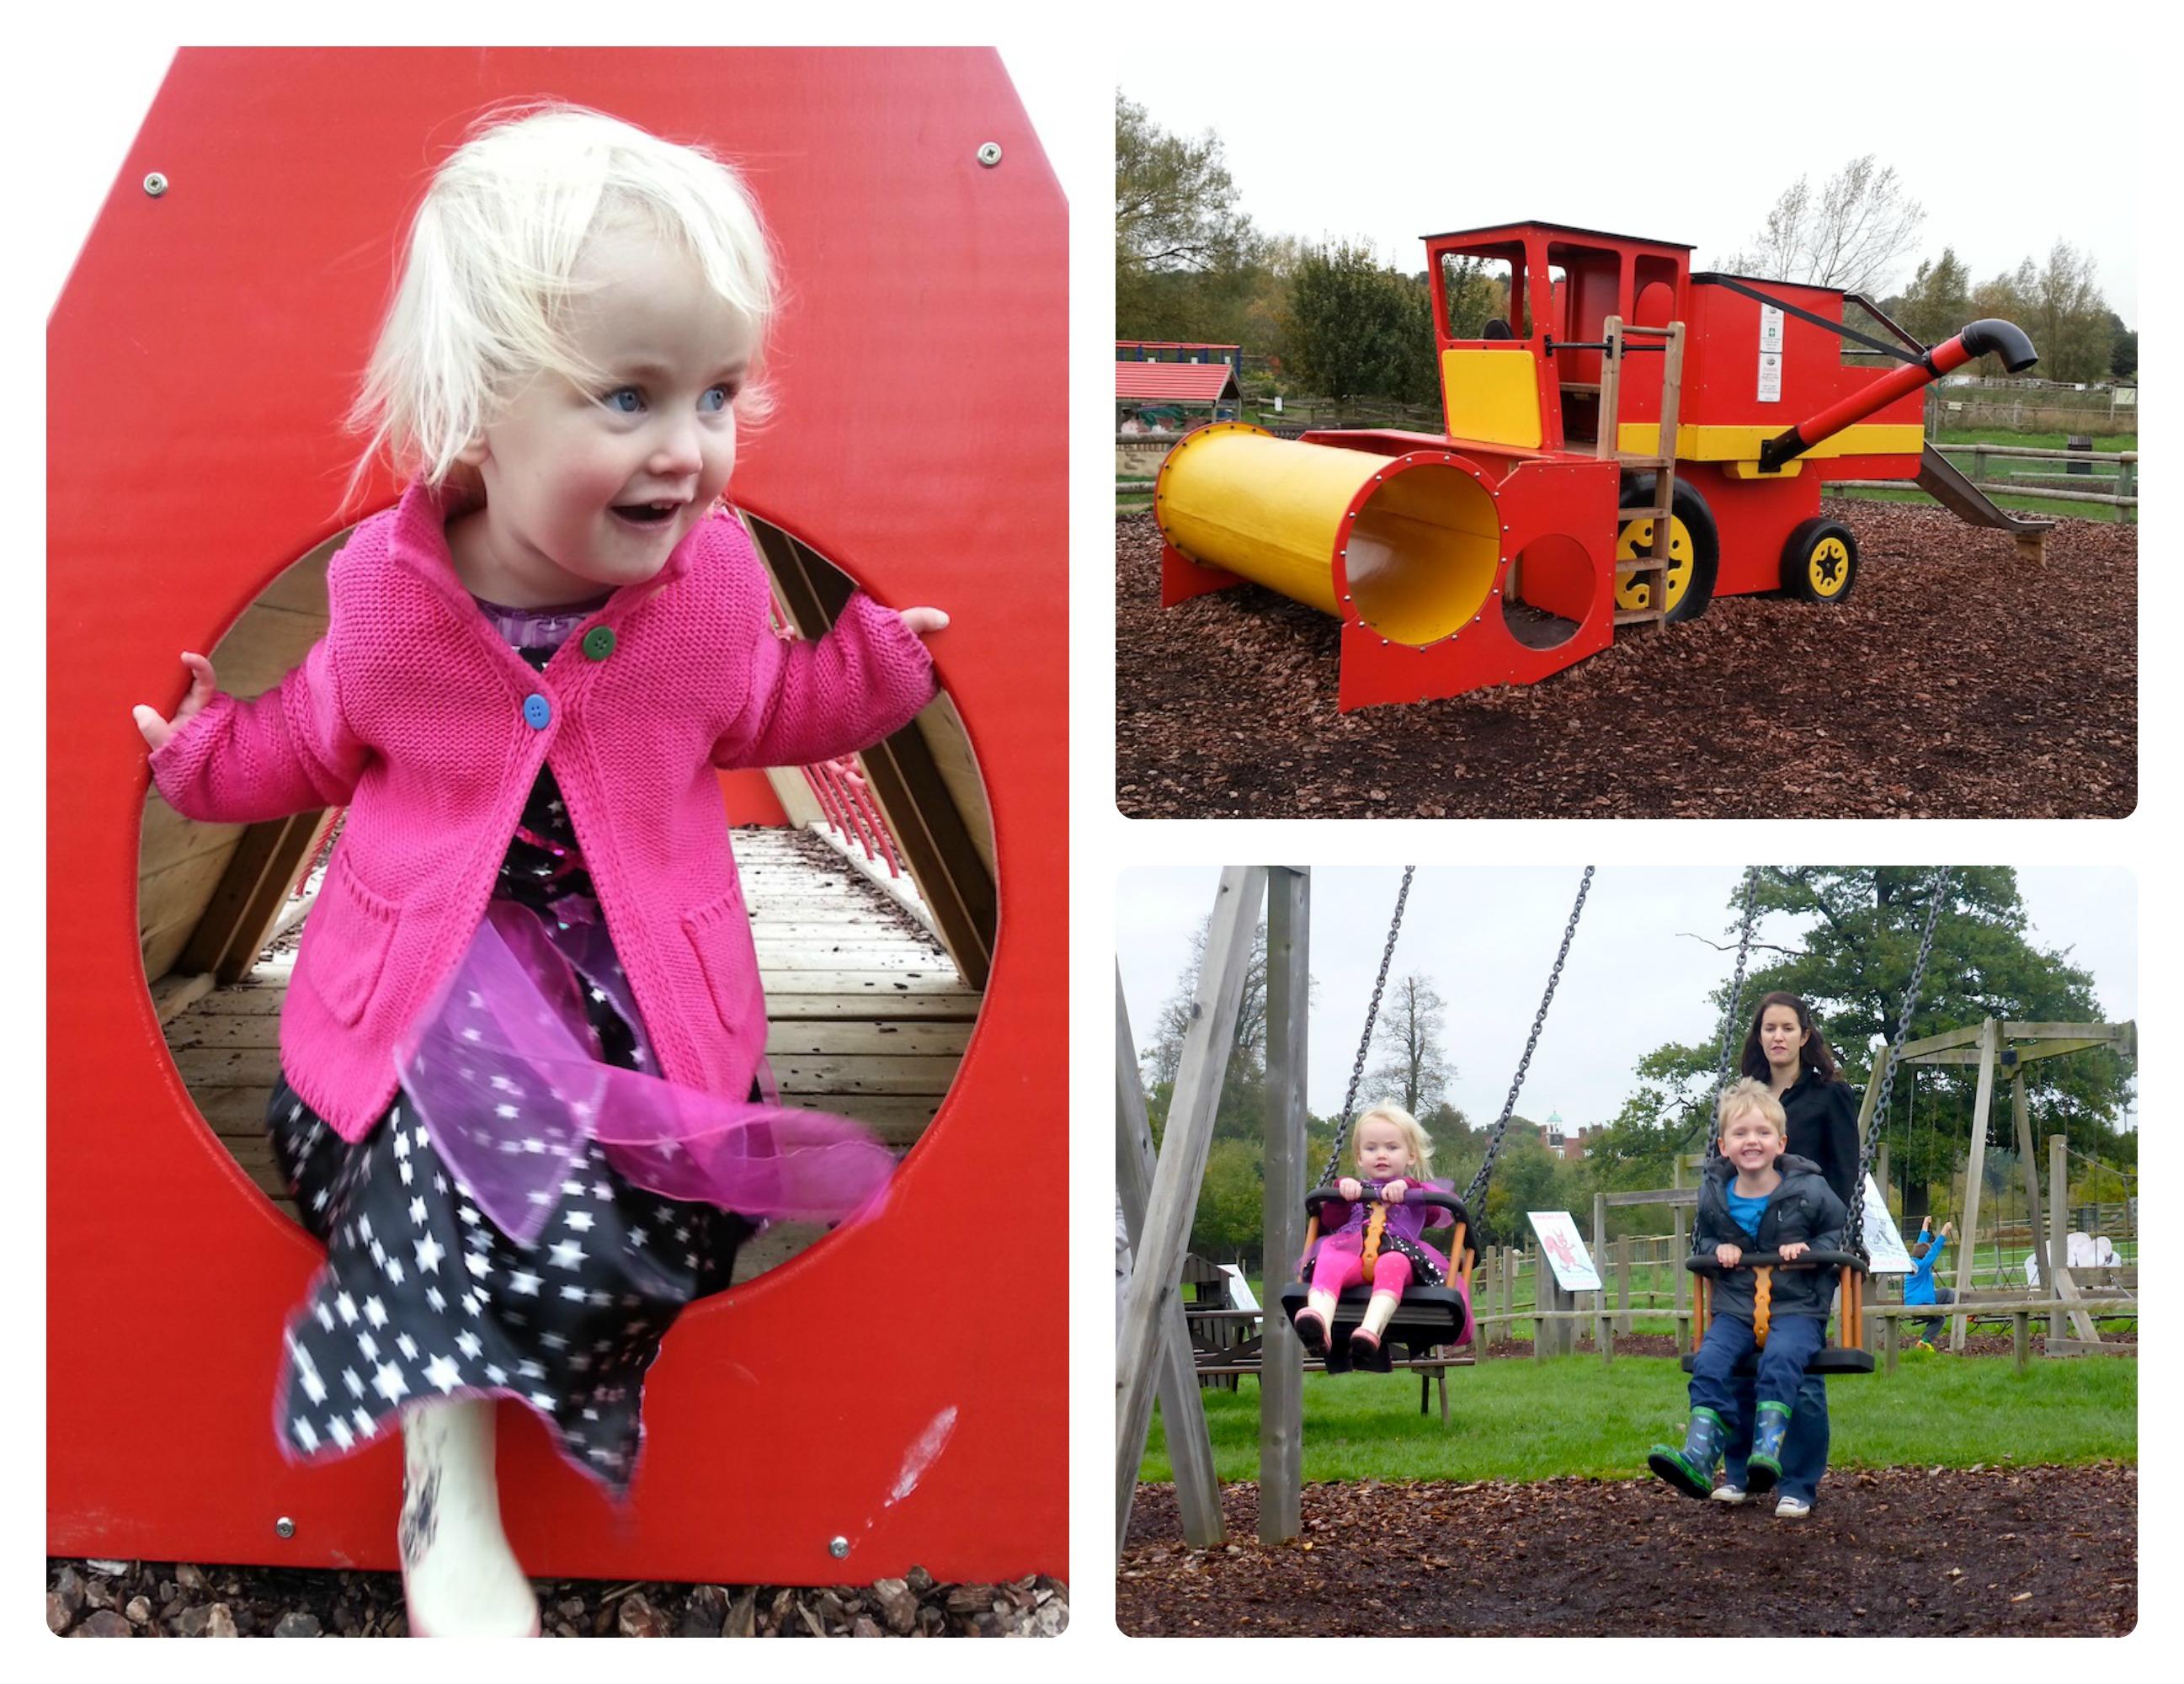 willows farm playgrounds